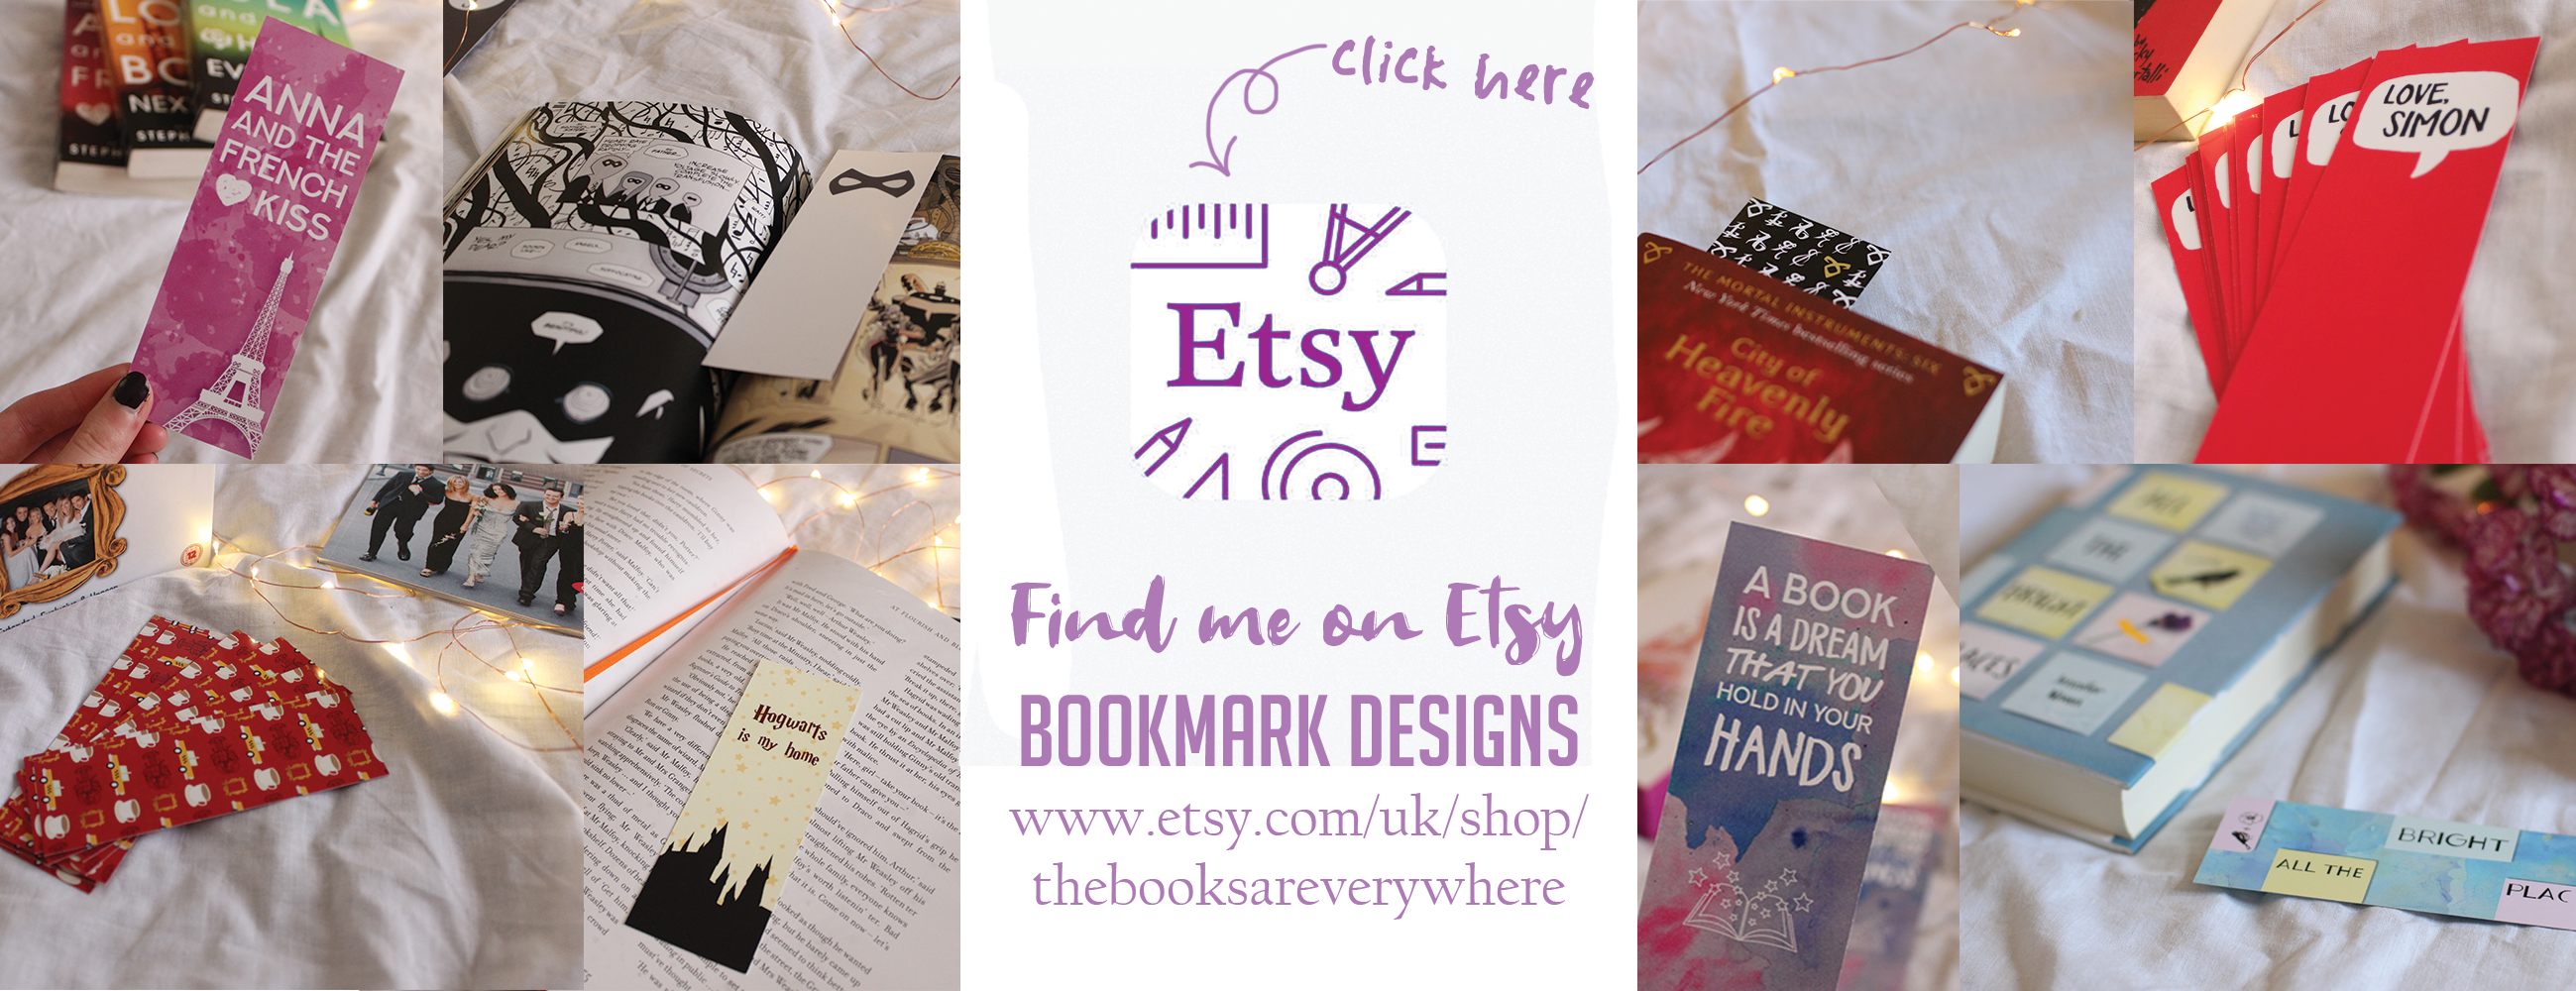 www.etsy.com/uk/shop/thebooksareverywhere